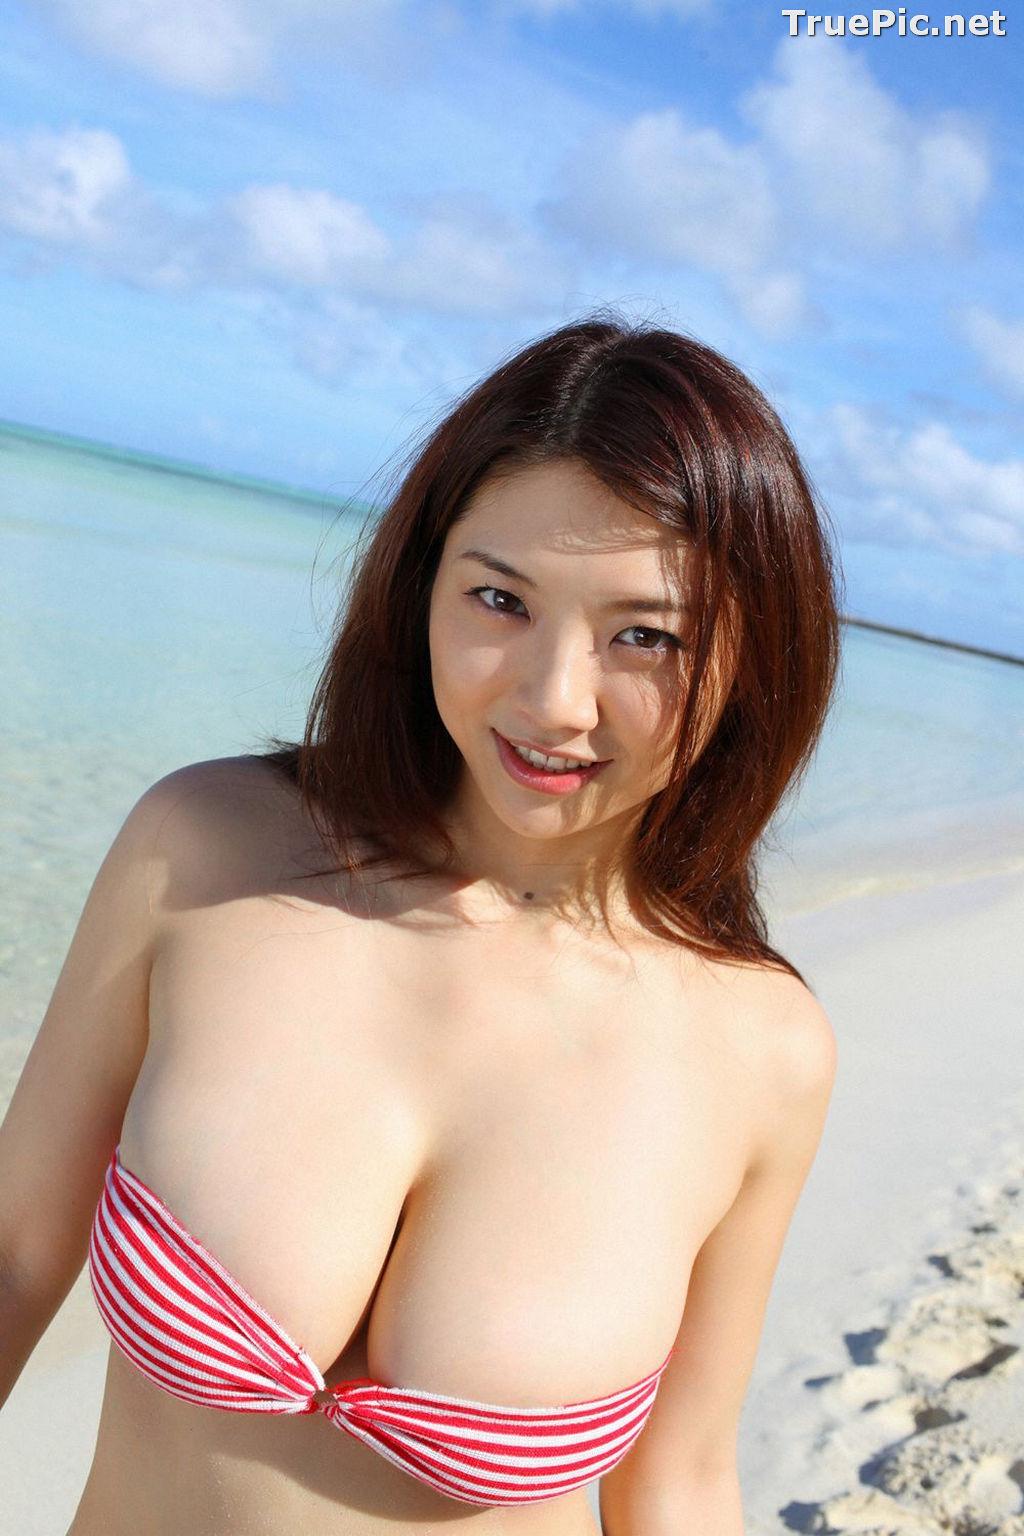 Image [YS Web] Vol.306 - Japanese Actress and Gravure Idol - Hitomi Aizawa - TruePic.net - Picture-1